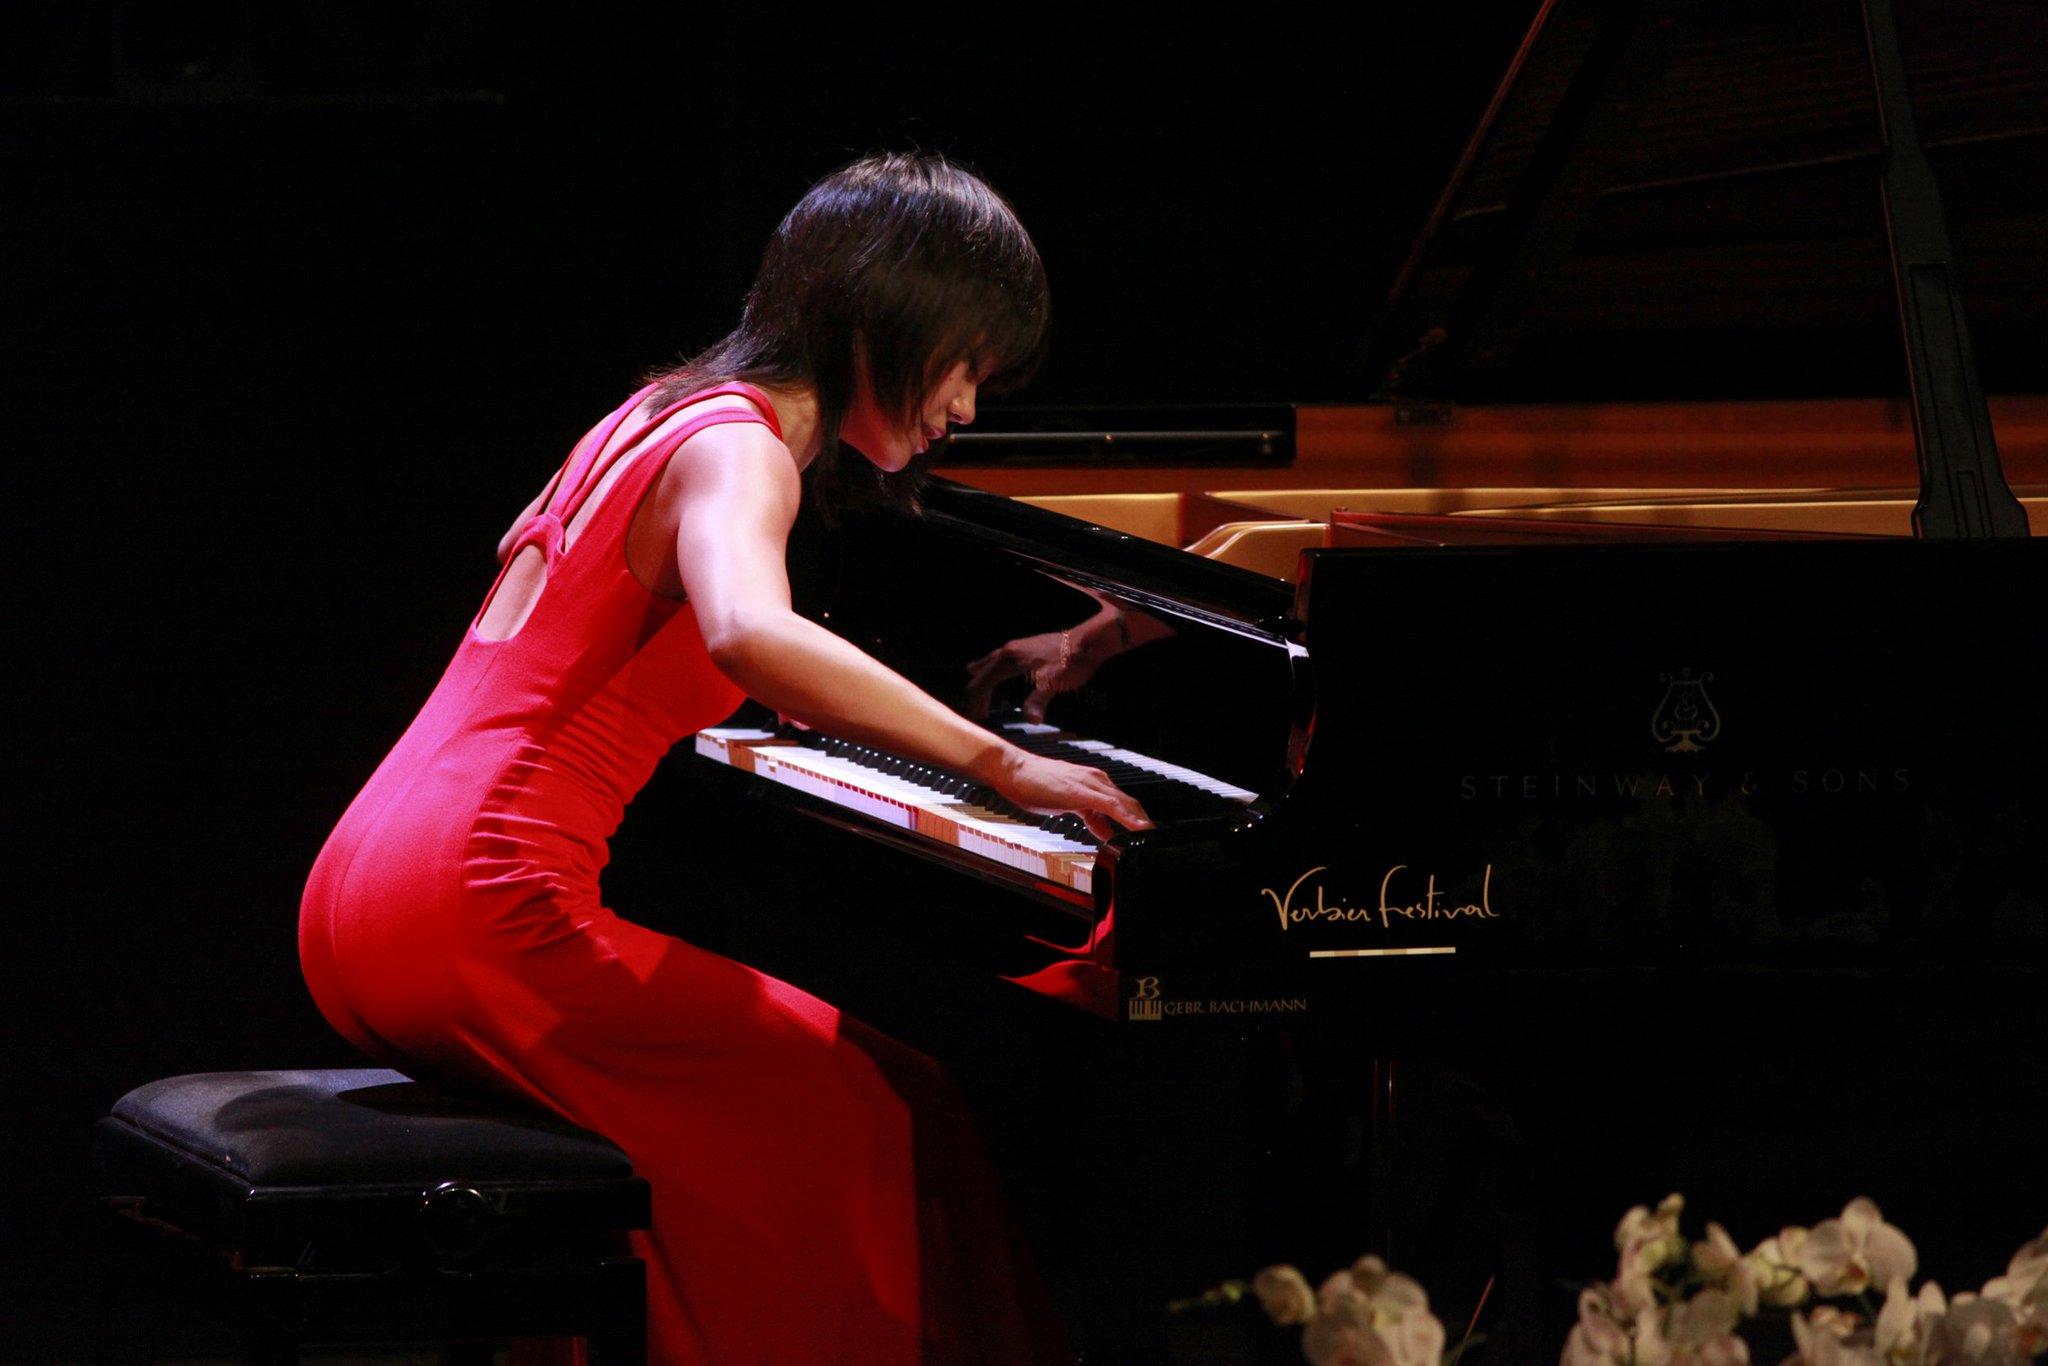 Reloaded twaddle – RT @DGclassics: Having made her @VerbierFestival debut ten years ago, @YujaWang ...